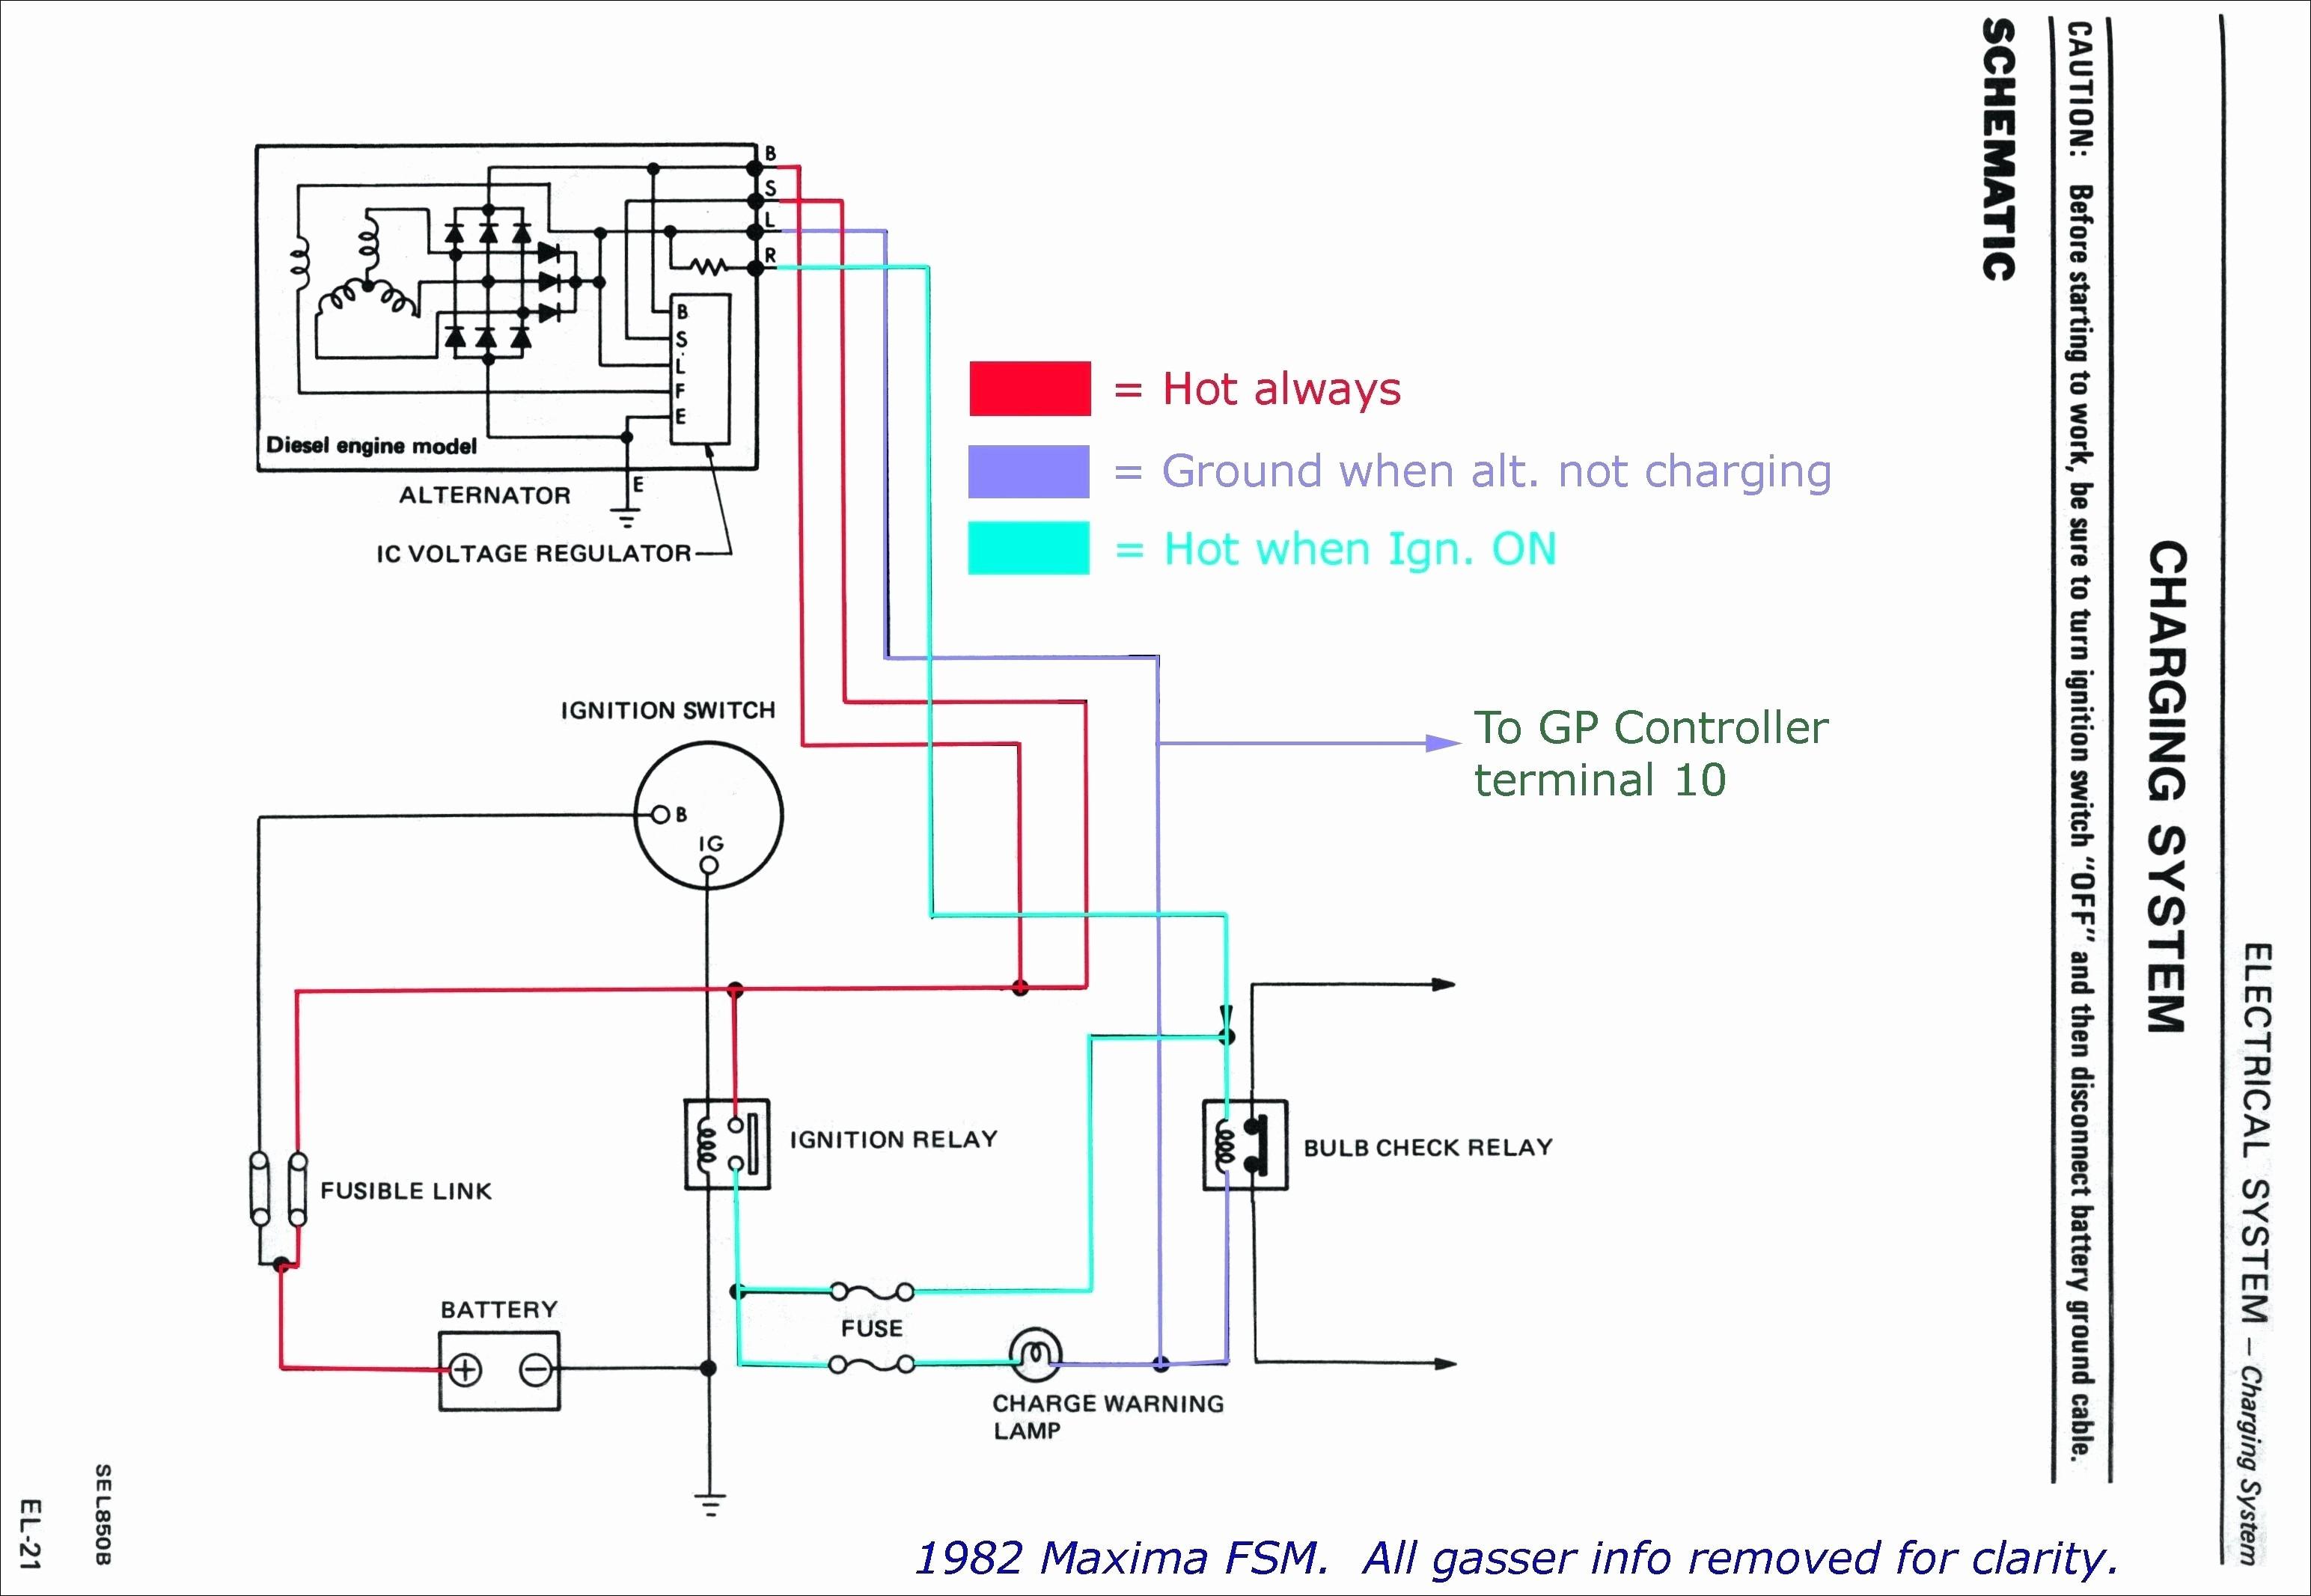 Incredible Nissan Patrol Zd30 Wiring Diagram Schematic Diagram Wiring Cloud Grayisramohammedshrineorg